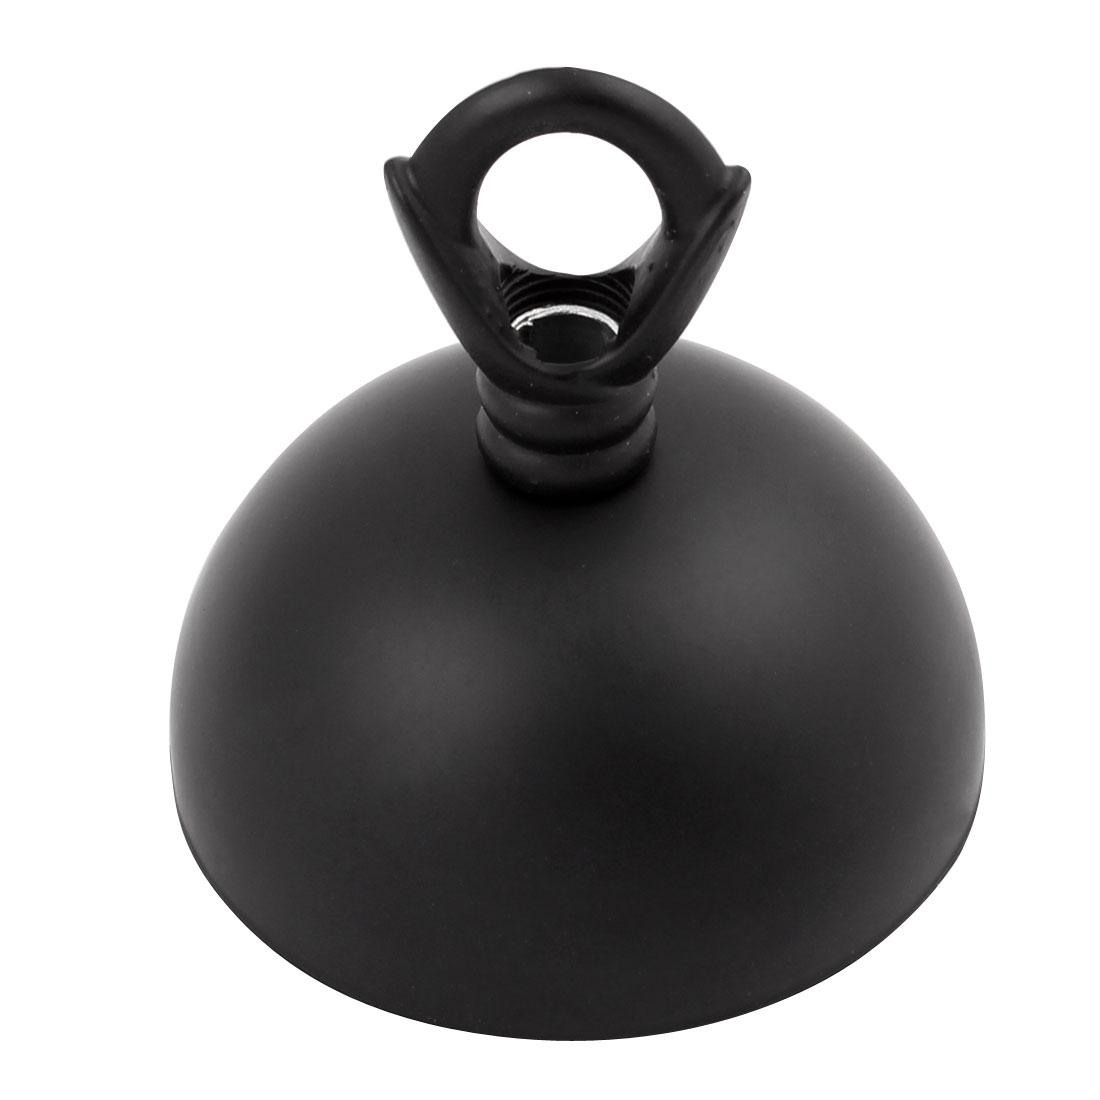 Lamp Base Ceiling Hook Plate Holder Light Bulb Fitting Accessory 60mm Dia Black